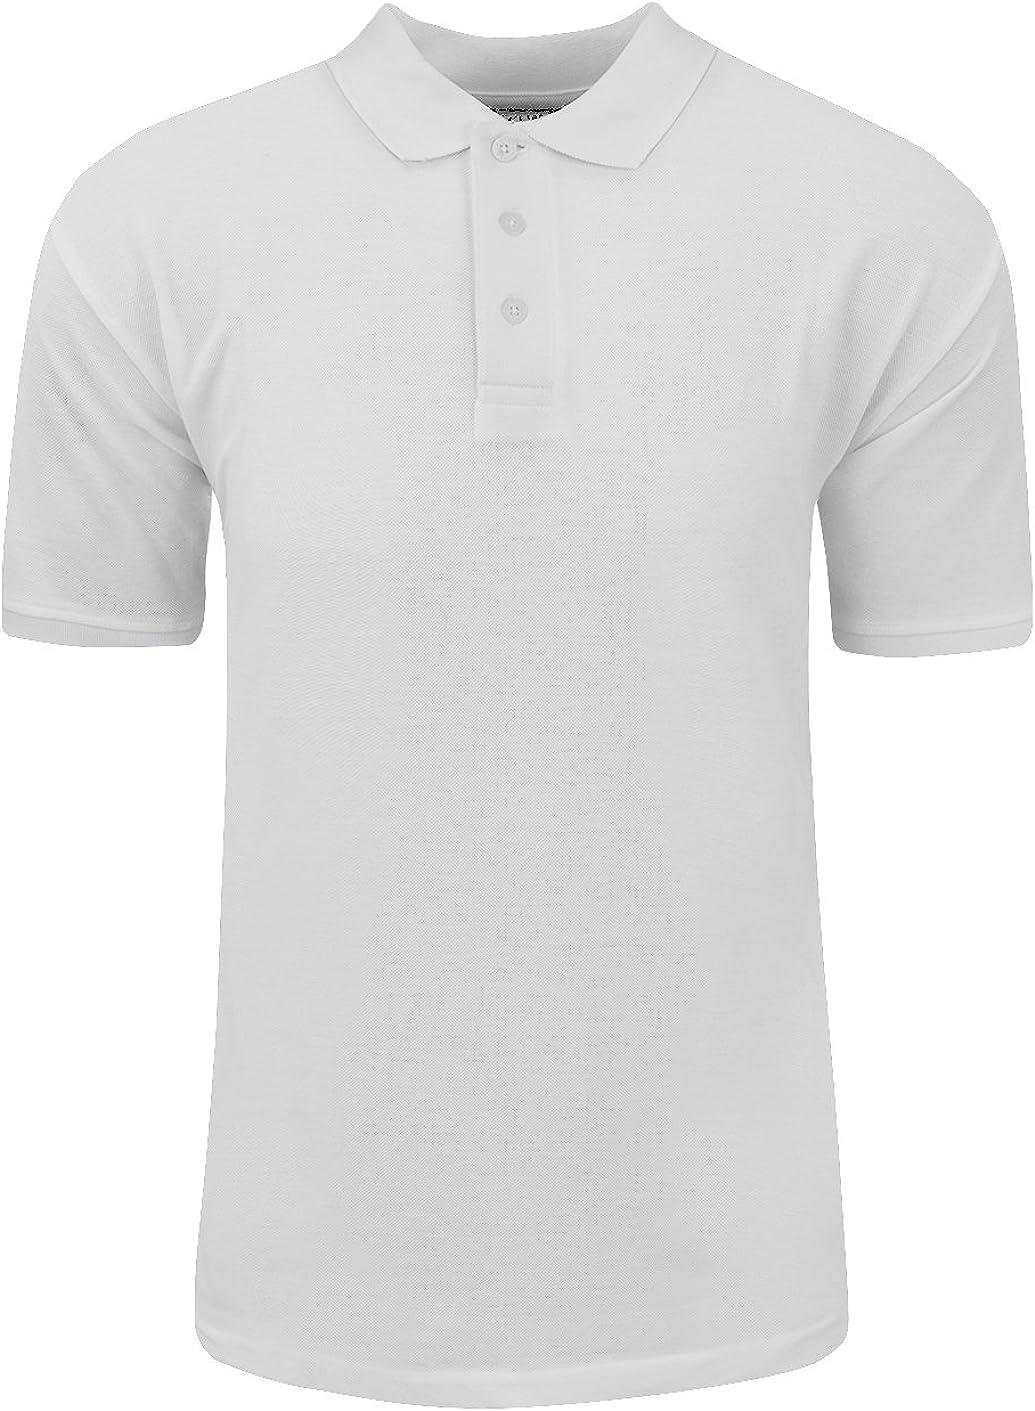 Shaka Bargain sale Wear Men's Polo Shirt Slee Max 62% OFF Pique Short Classic –